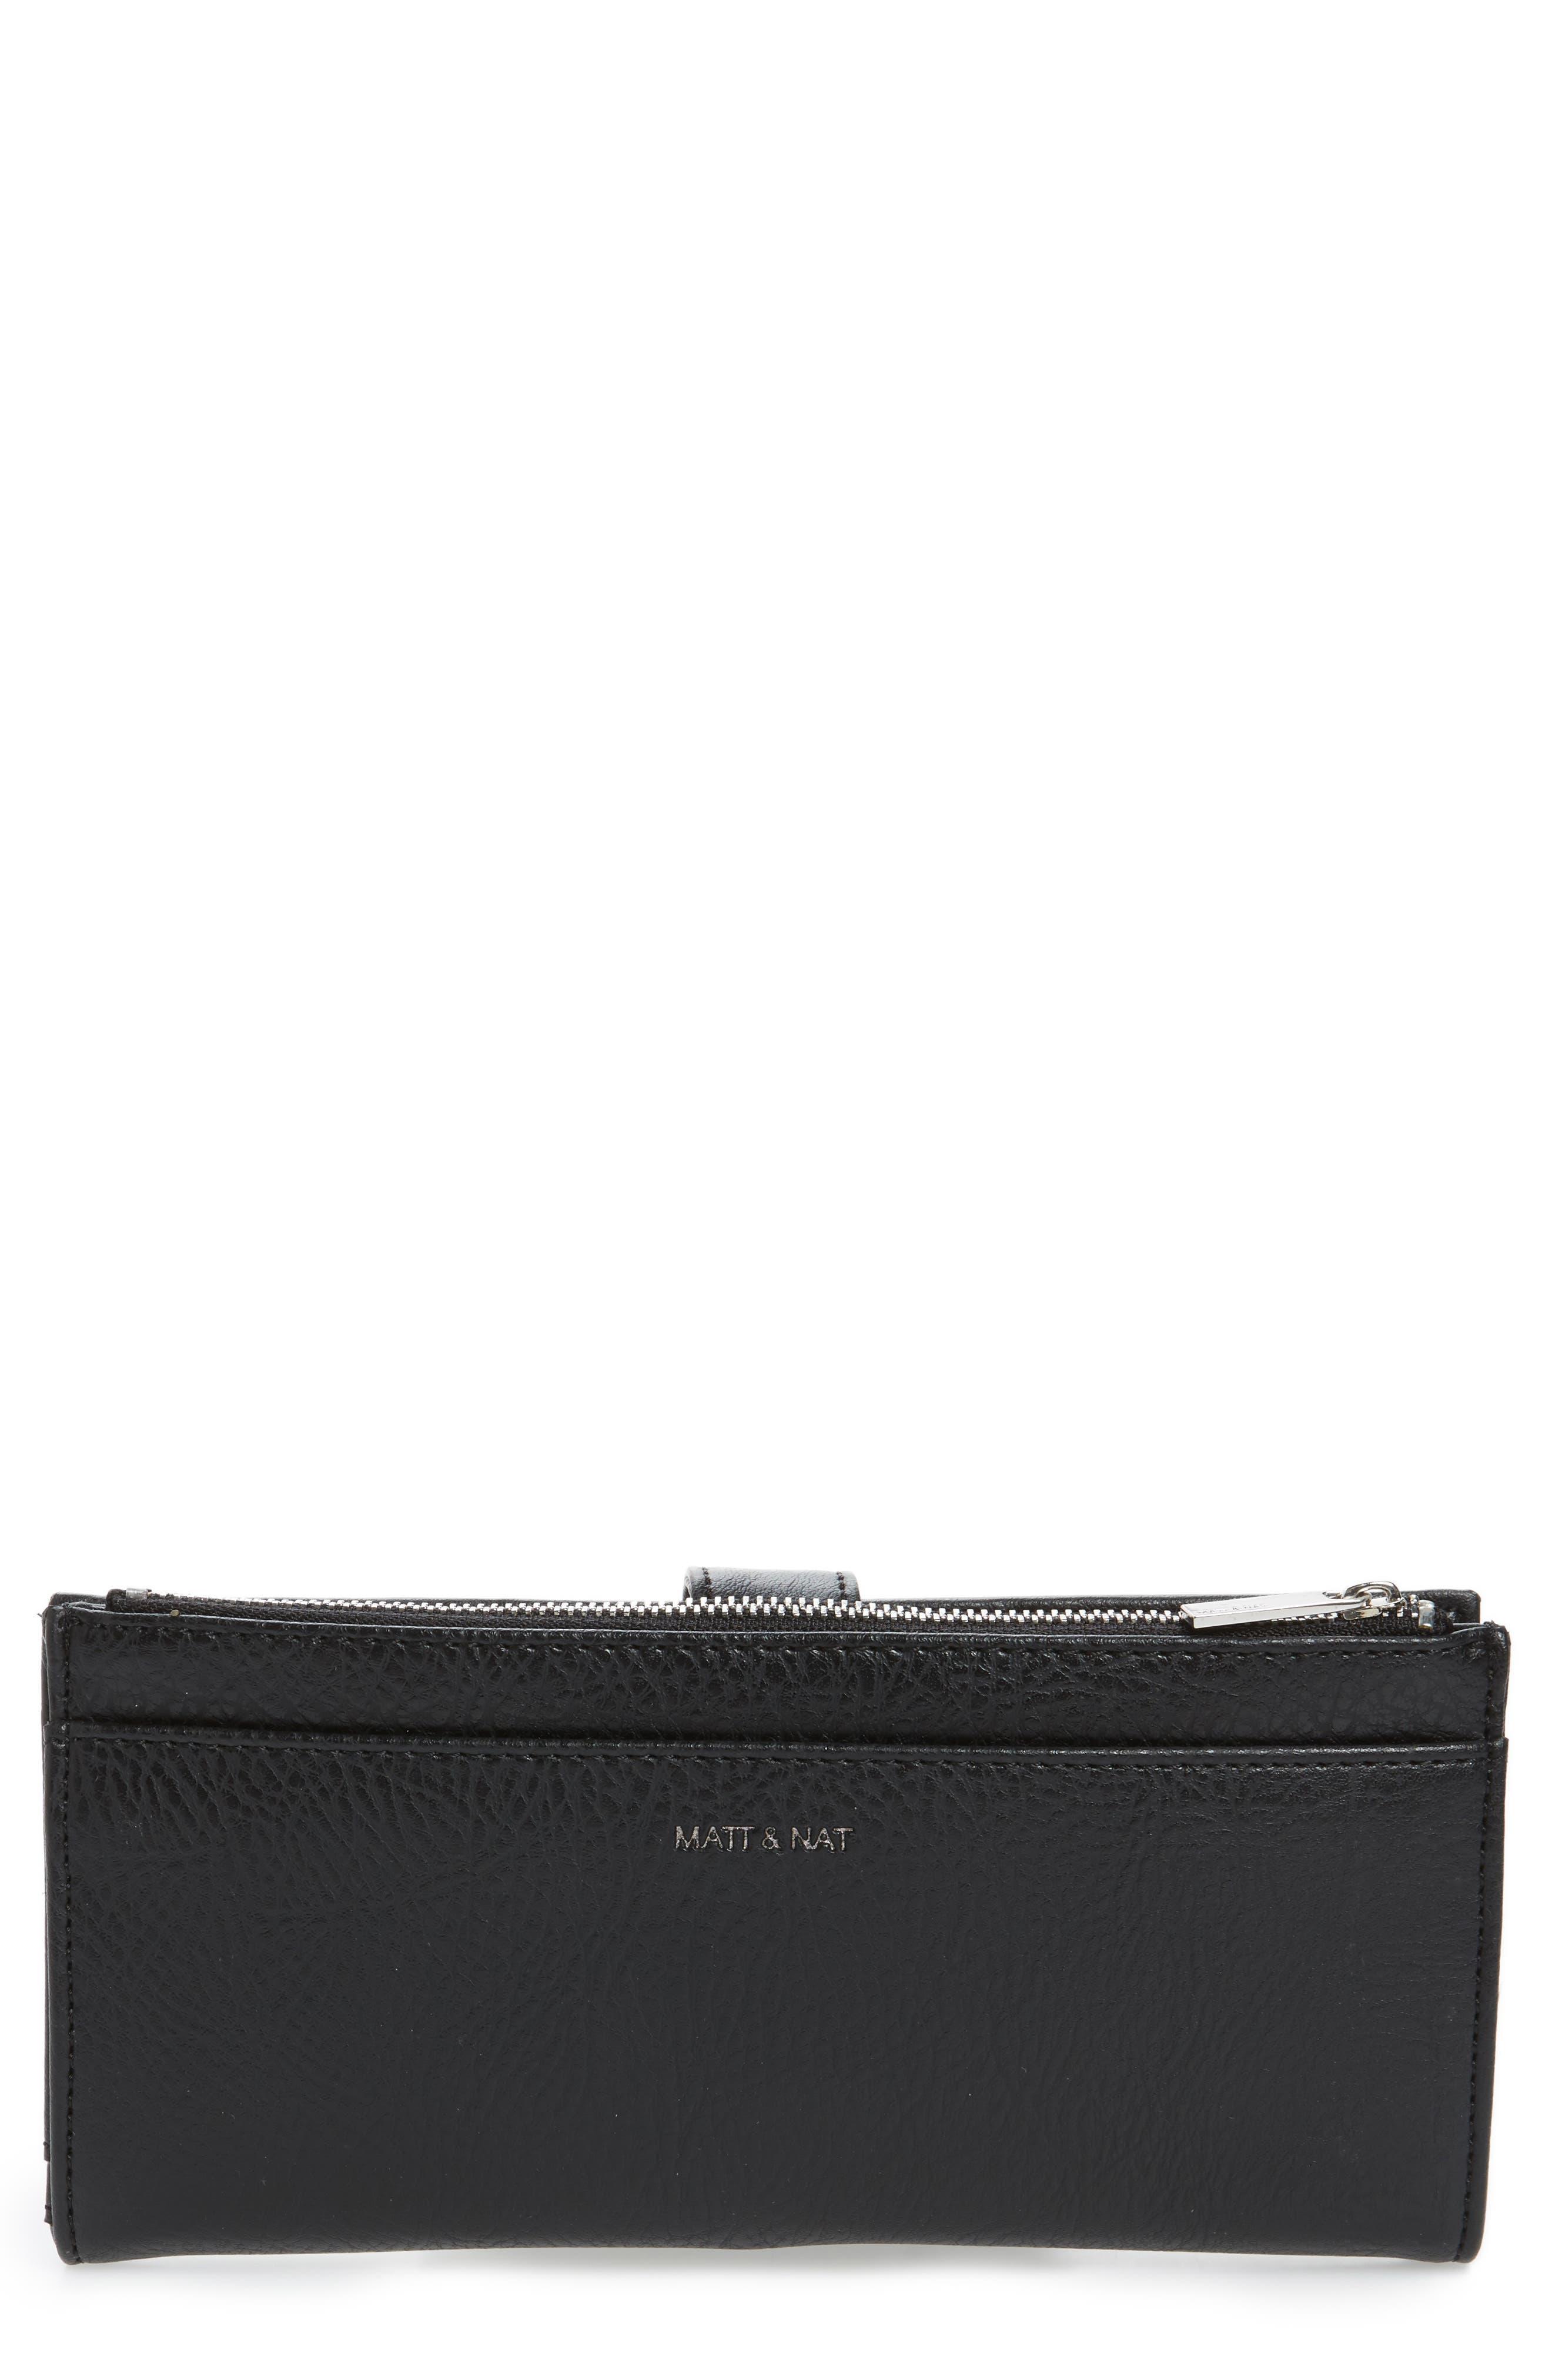 Matt & Nat Motiv Faux Leather Continental Wallet -